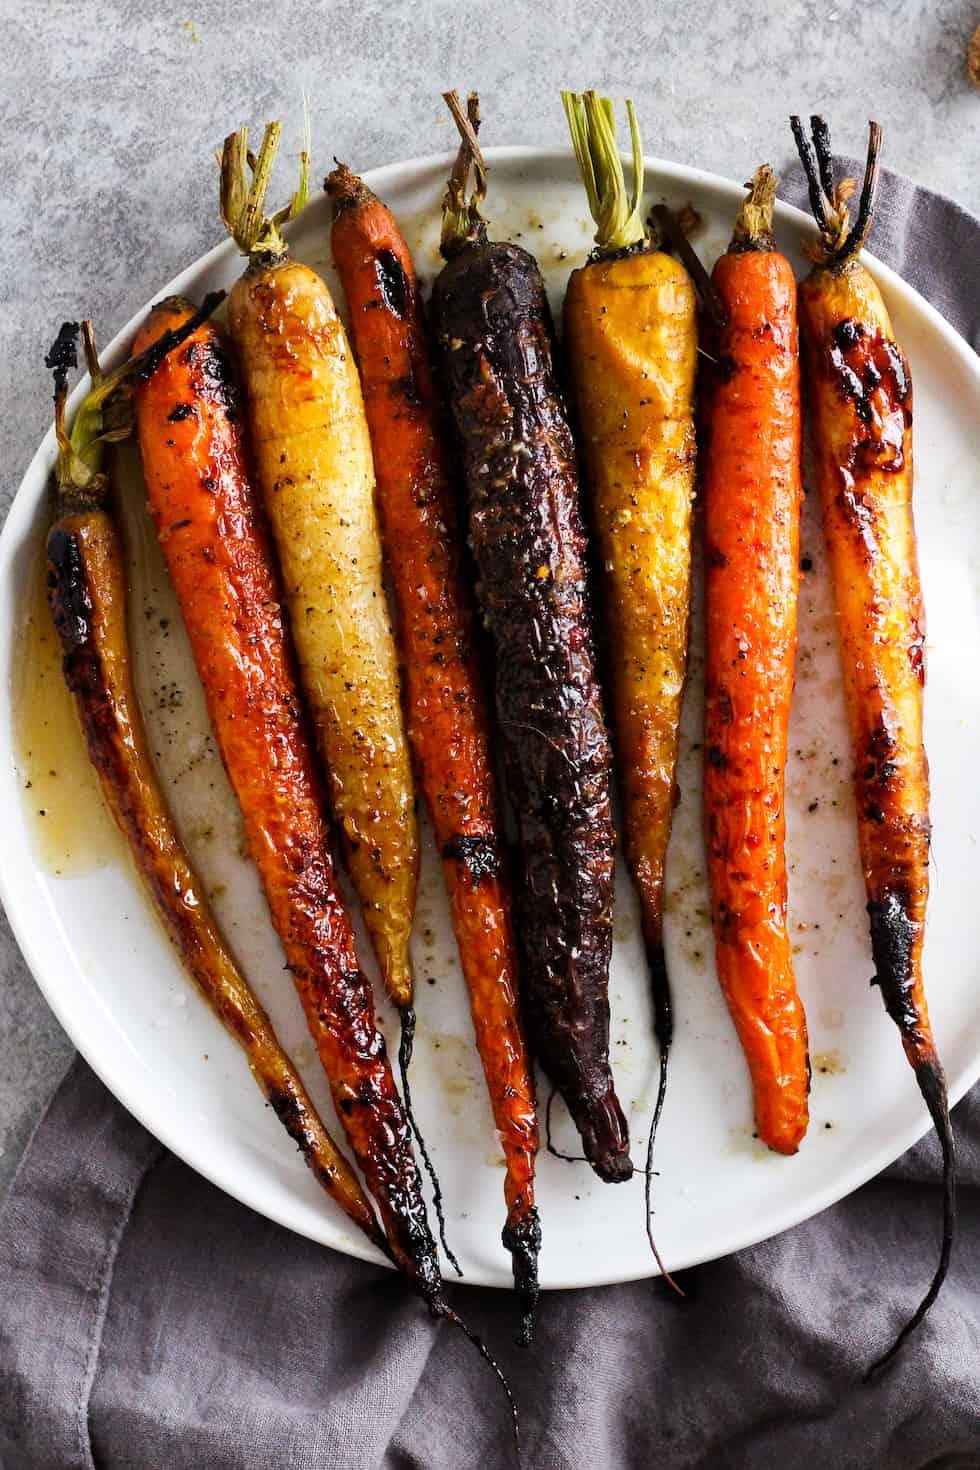 Roasted rainbow carrots on white plate